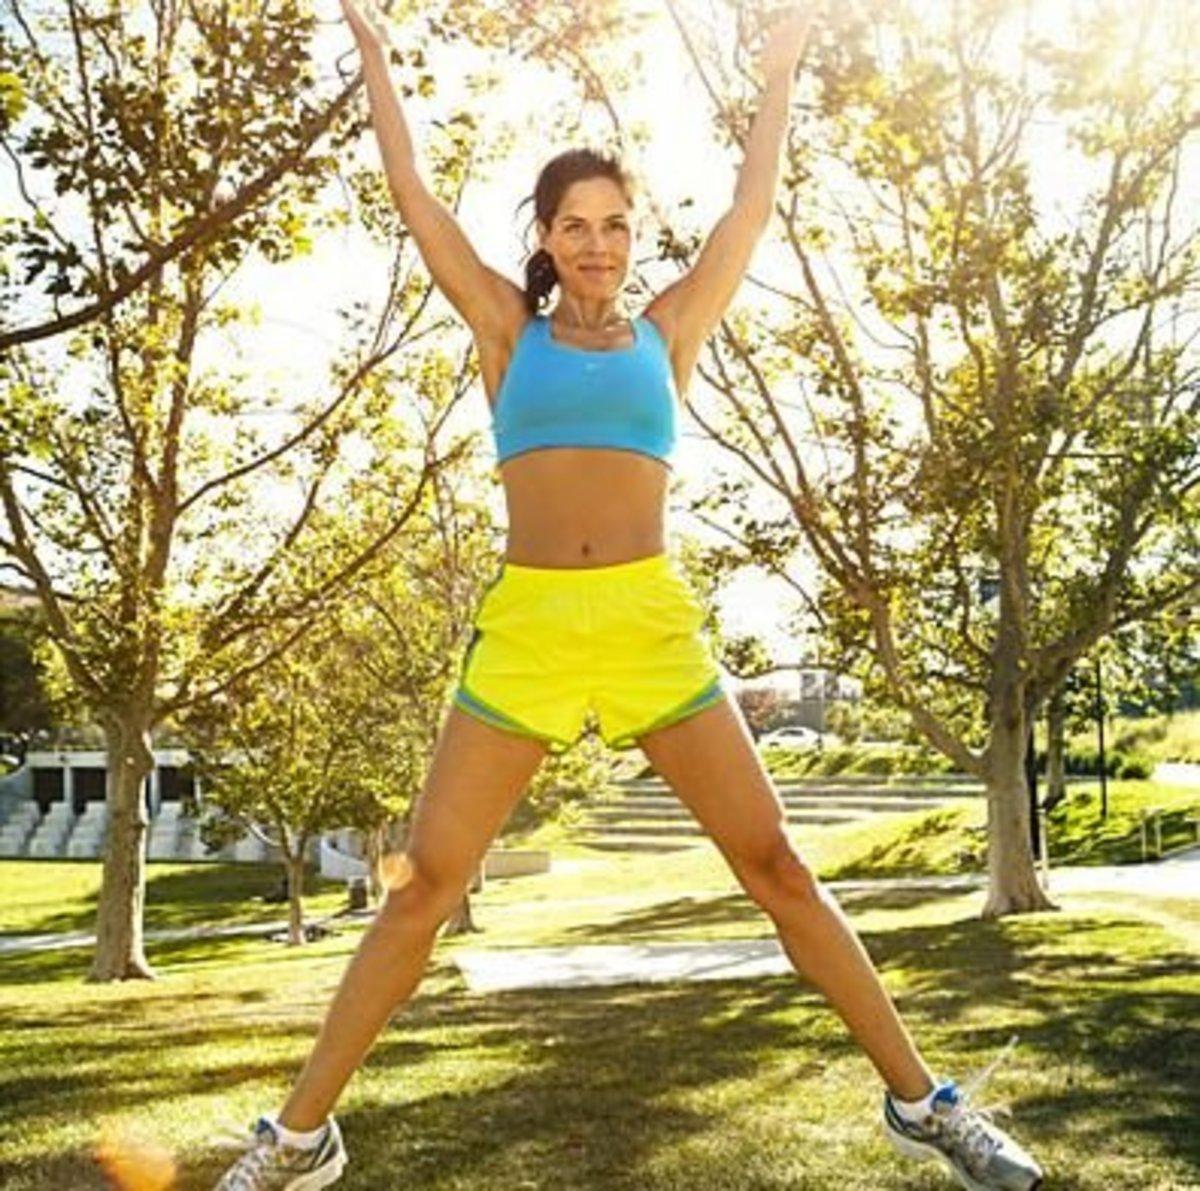 10-health-benefits-of-jumping-jacks